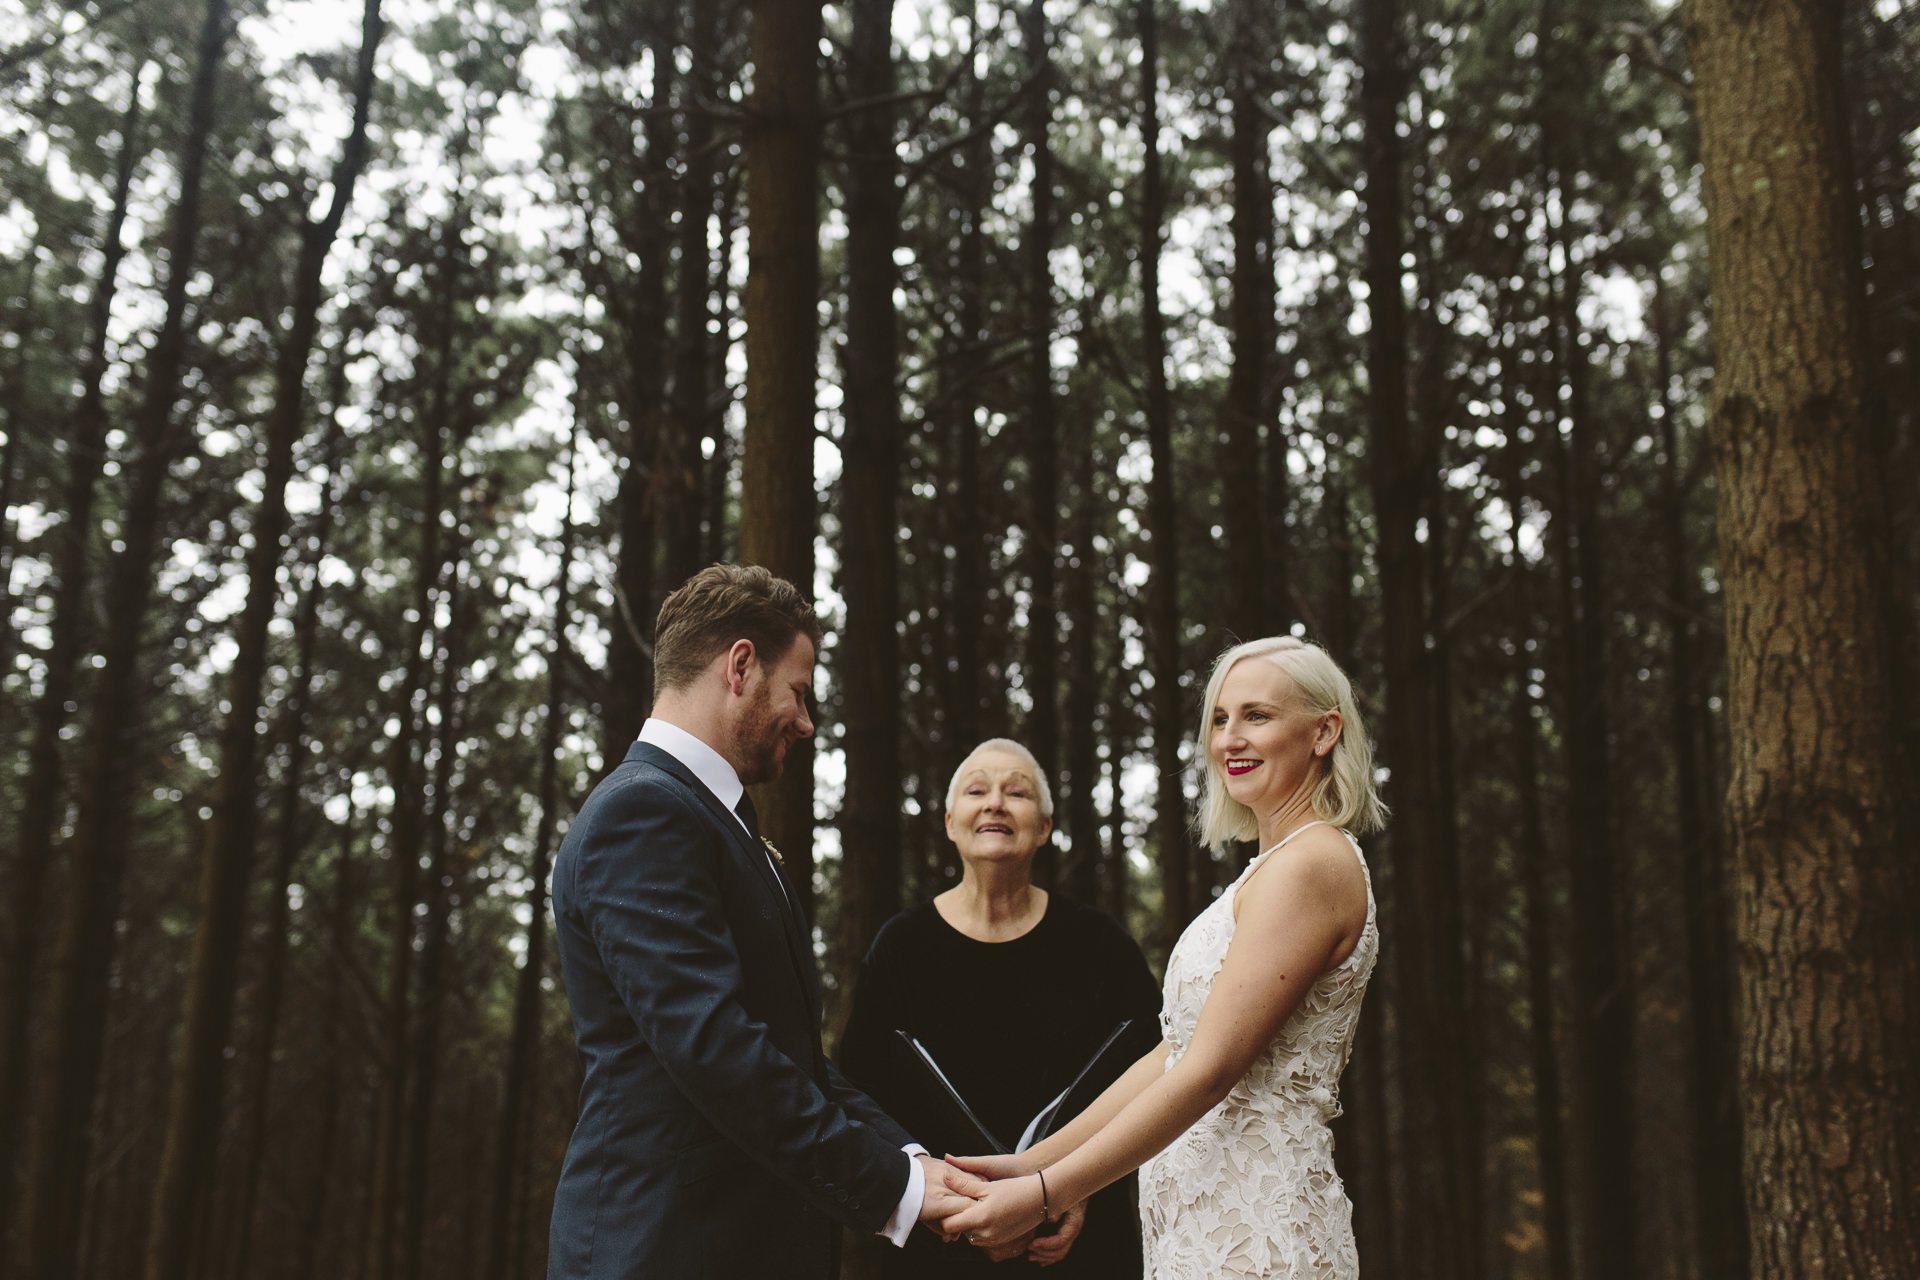 hamilton-wedding-portrait-photographer-at-147